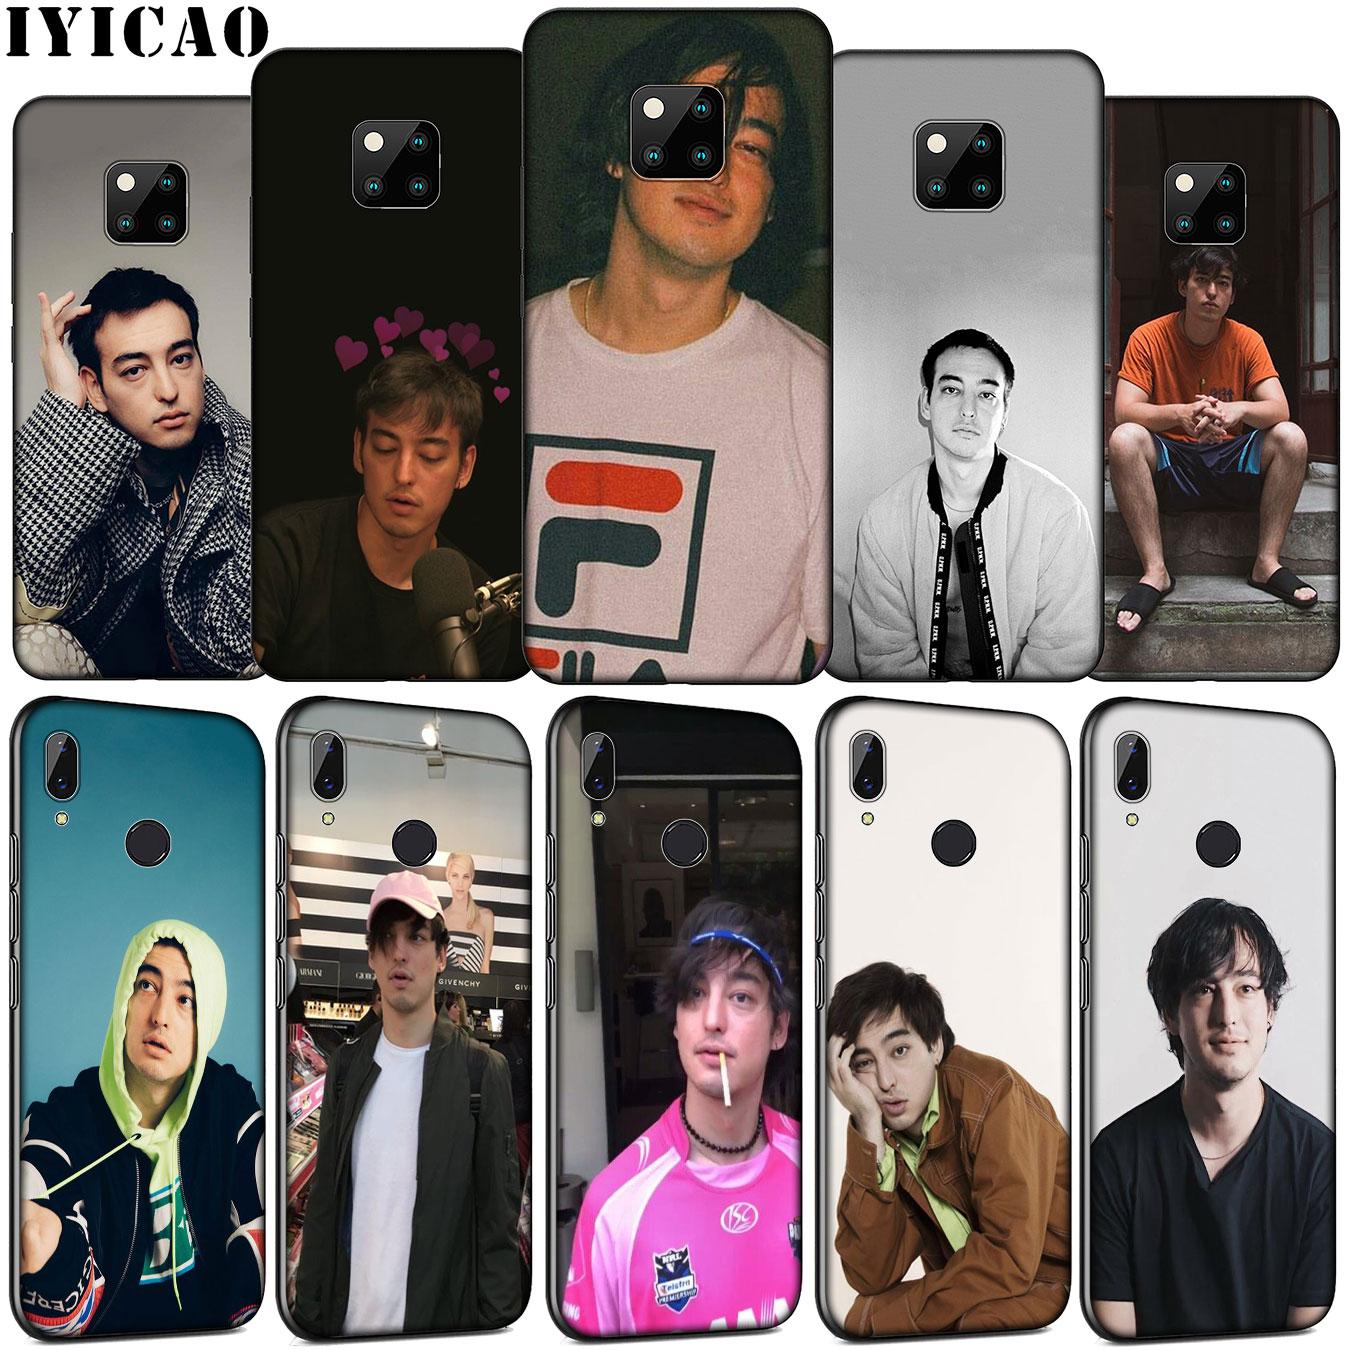 Joji IYICAO Miller Caso de Telefone Silicone Macio para Huawei Companheiro 30 20 10 Pro Nova 5i 4 3 3i 2i 2 Lite TPU Capa Preta